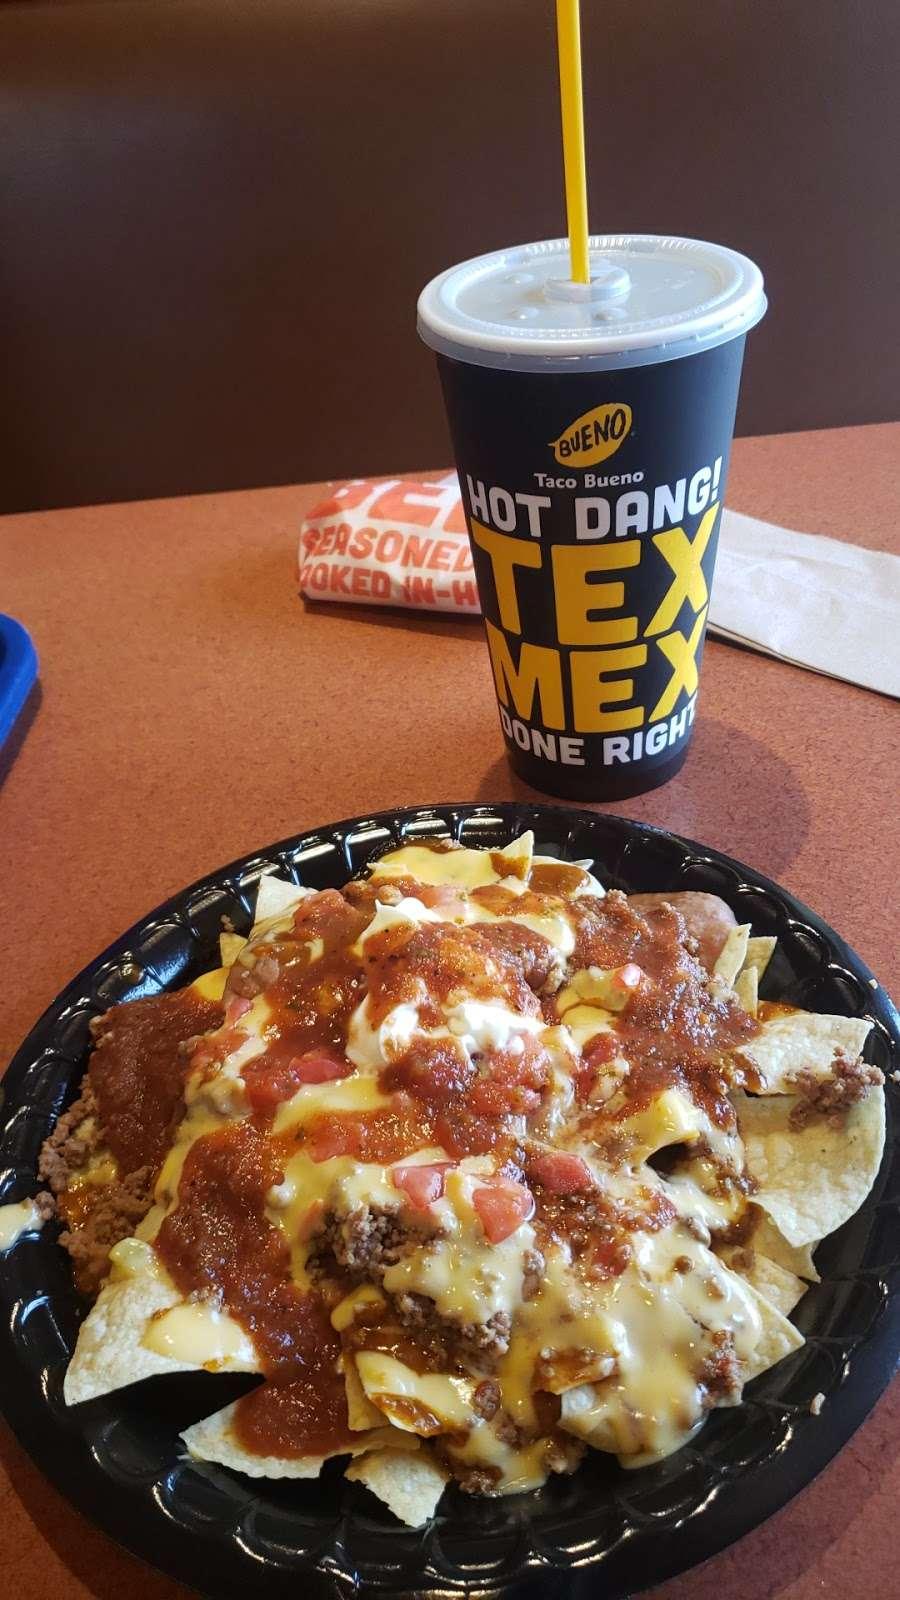 Taco Bueno - restaurant  | Photo 9 of 10 | Address: 2113 E Belt Line Rd, Richardson, TX 75081, USA | Phone: (972) 690-5373